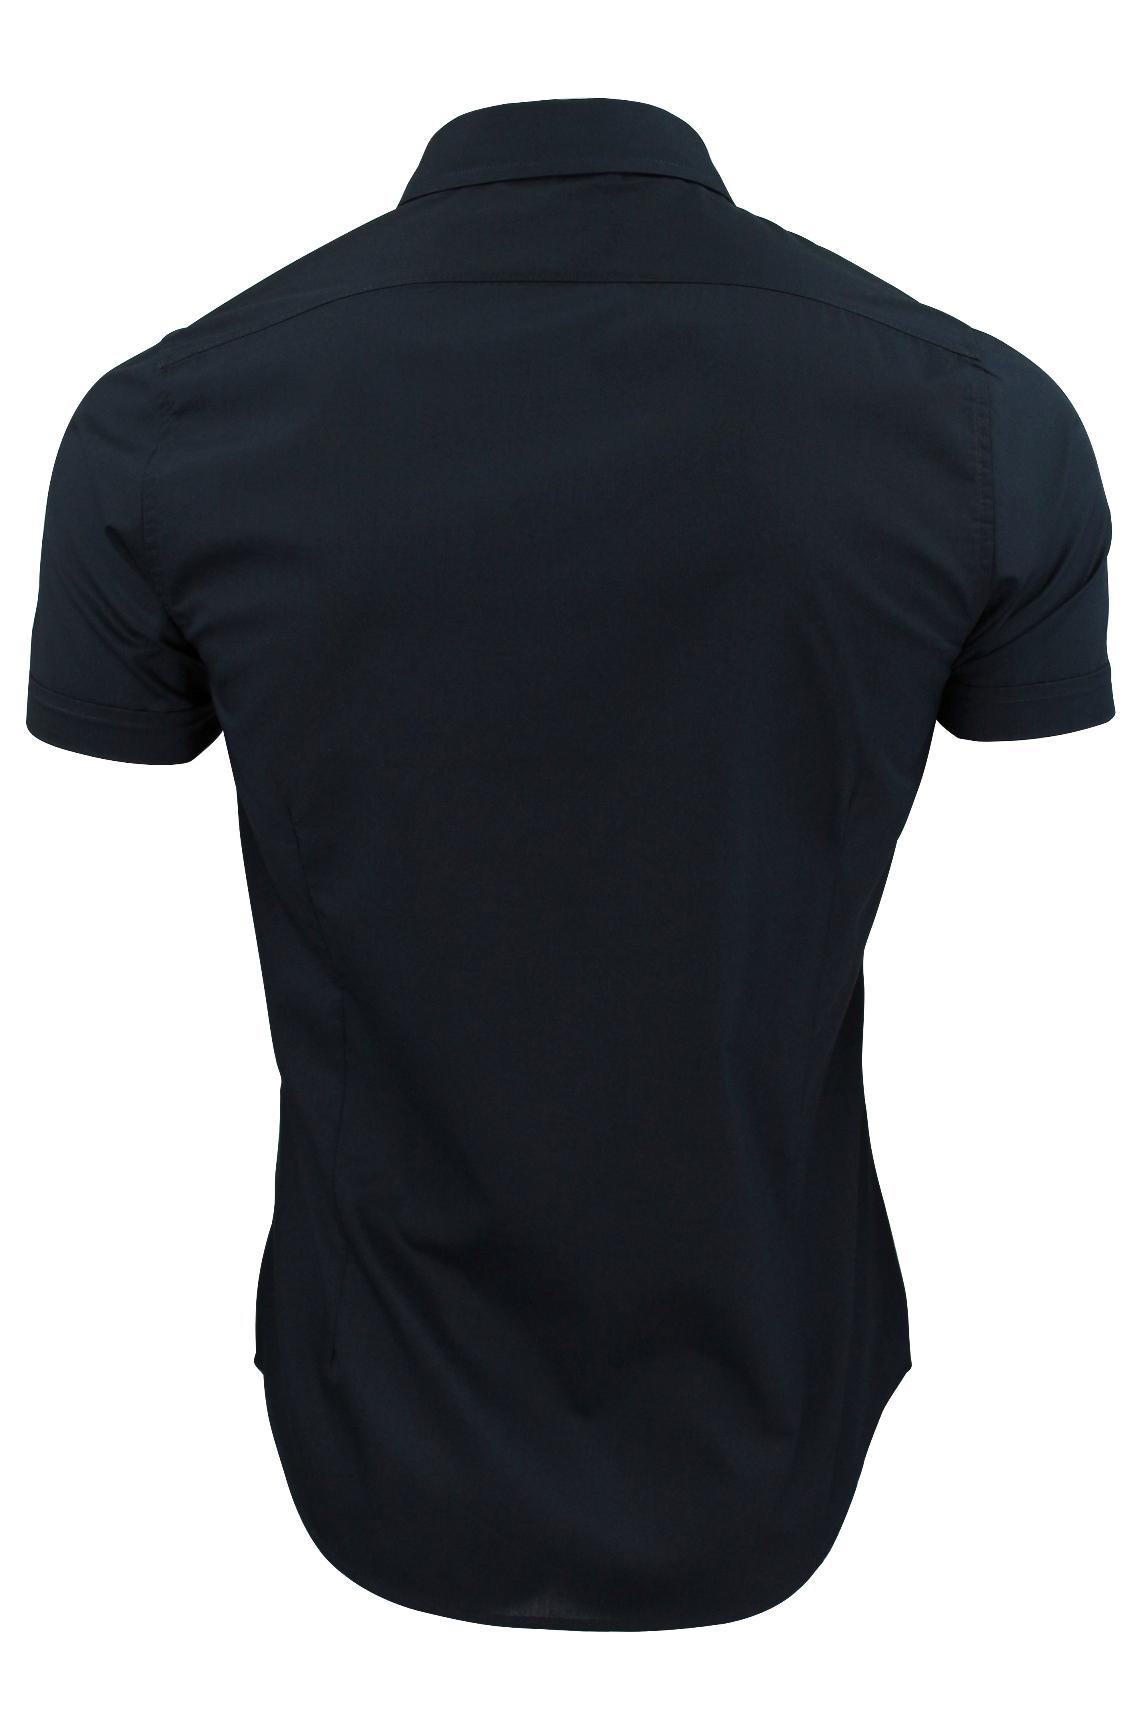 Brave-Soul-Mens-Plain-Shirt-Short-Sleeved-Slim-Fit thumbnail 20